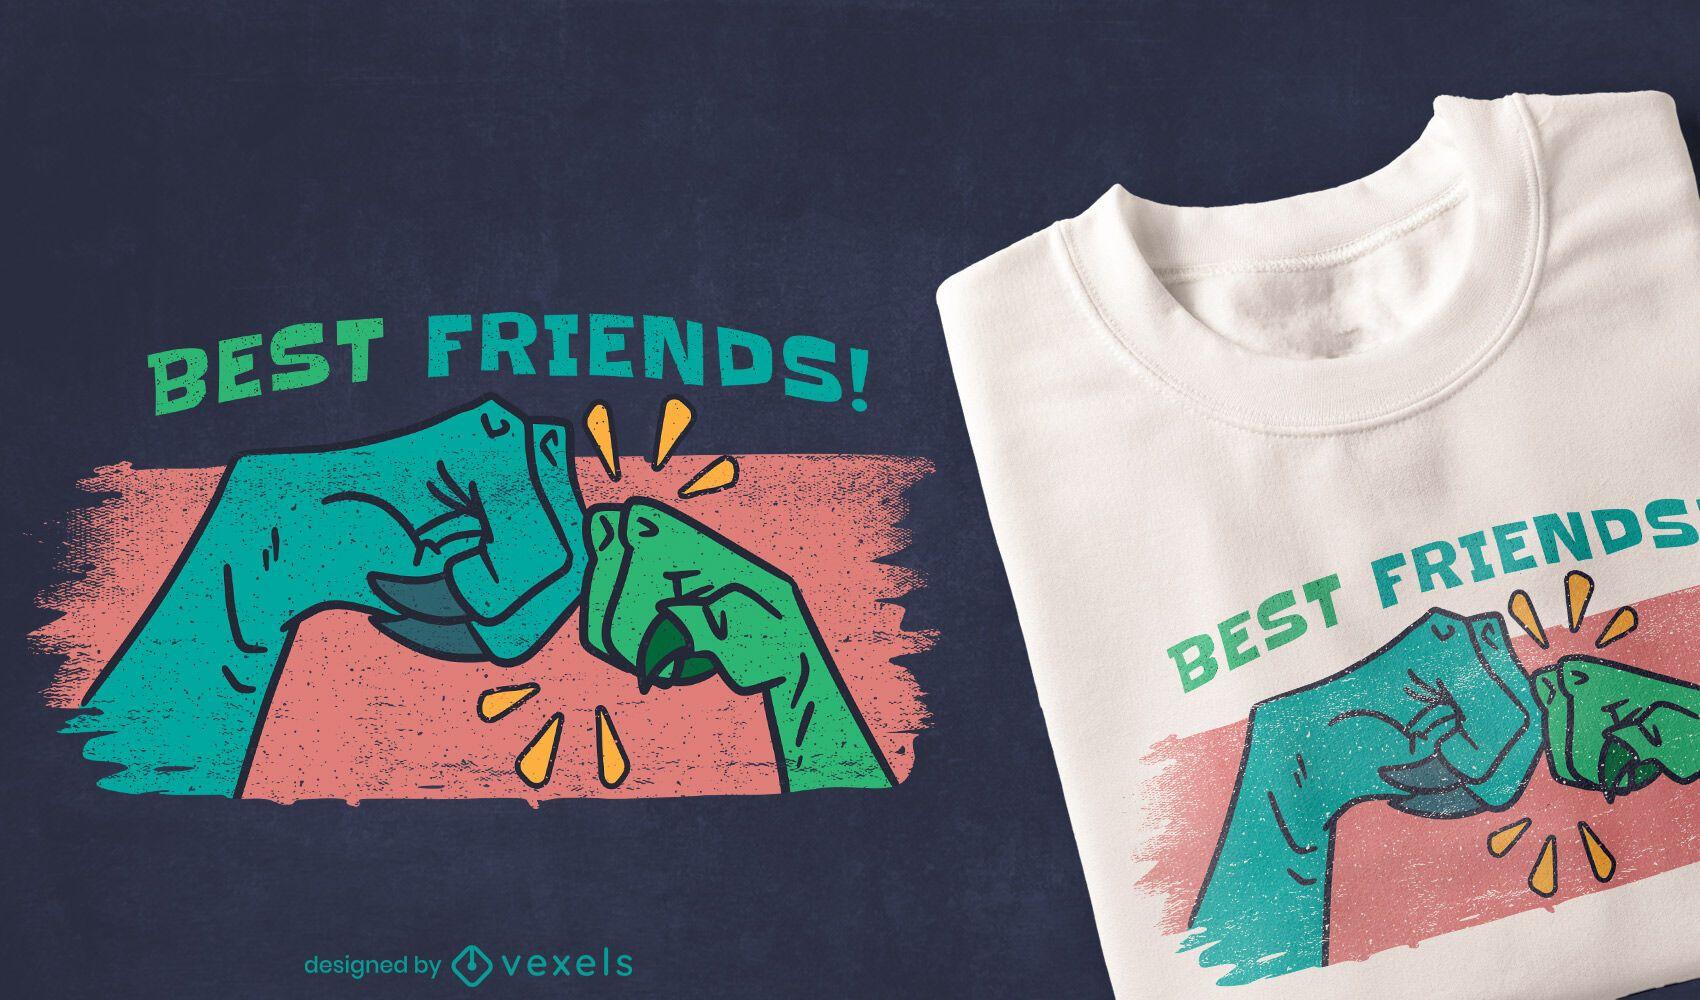 Dinosaur friends quote t-shirt design